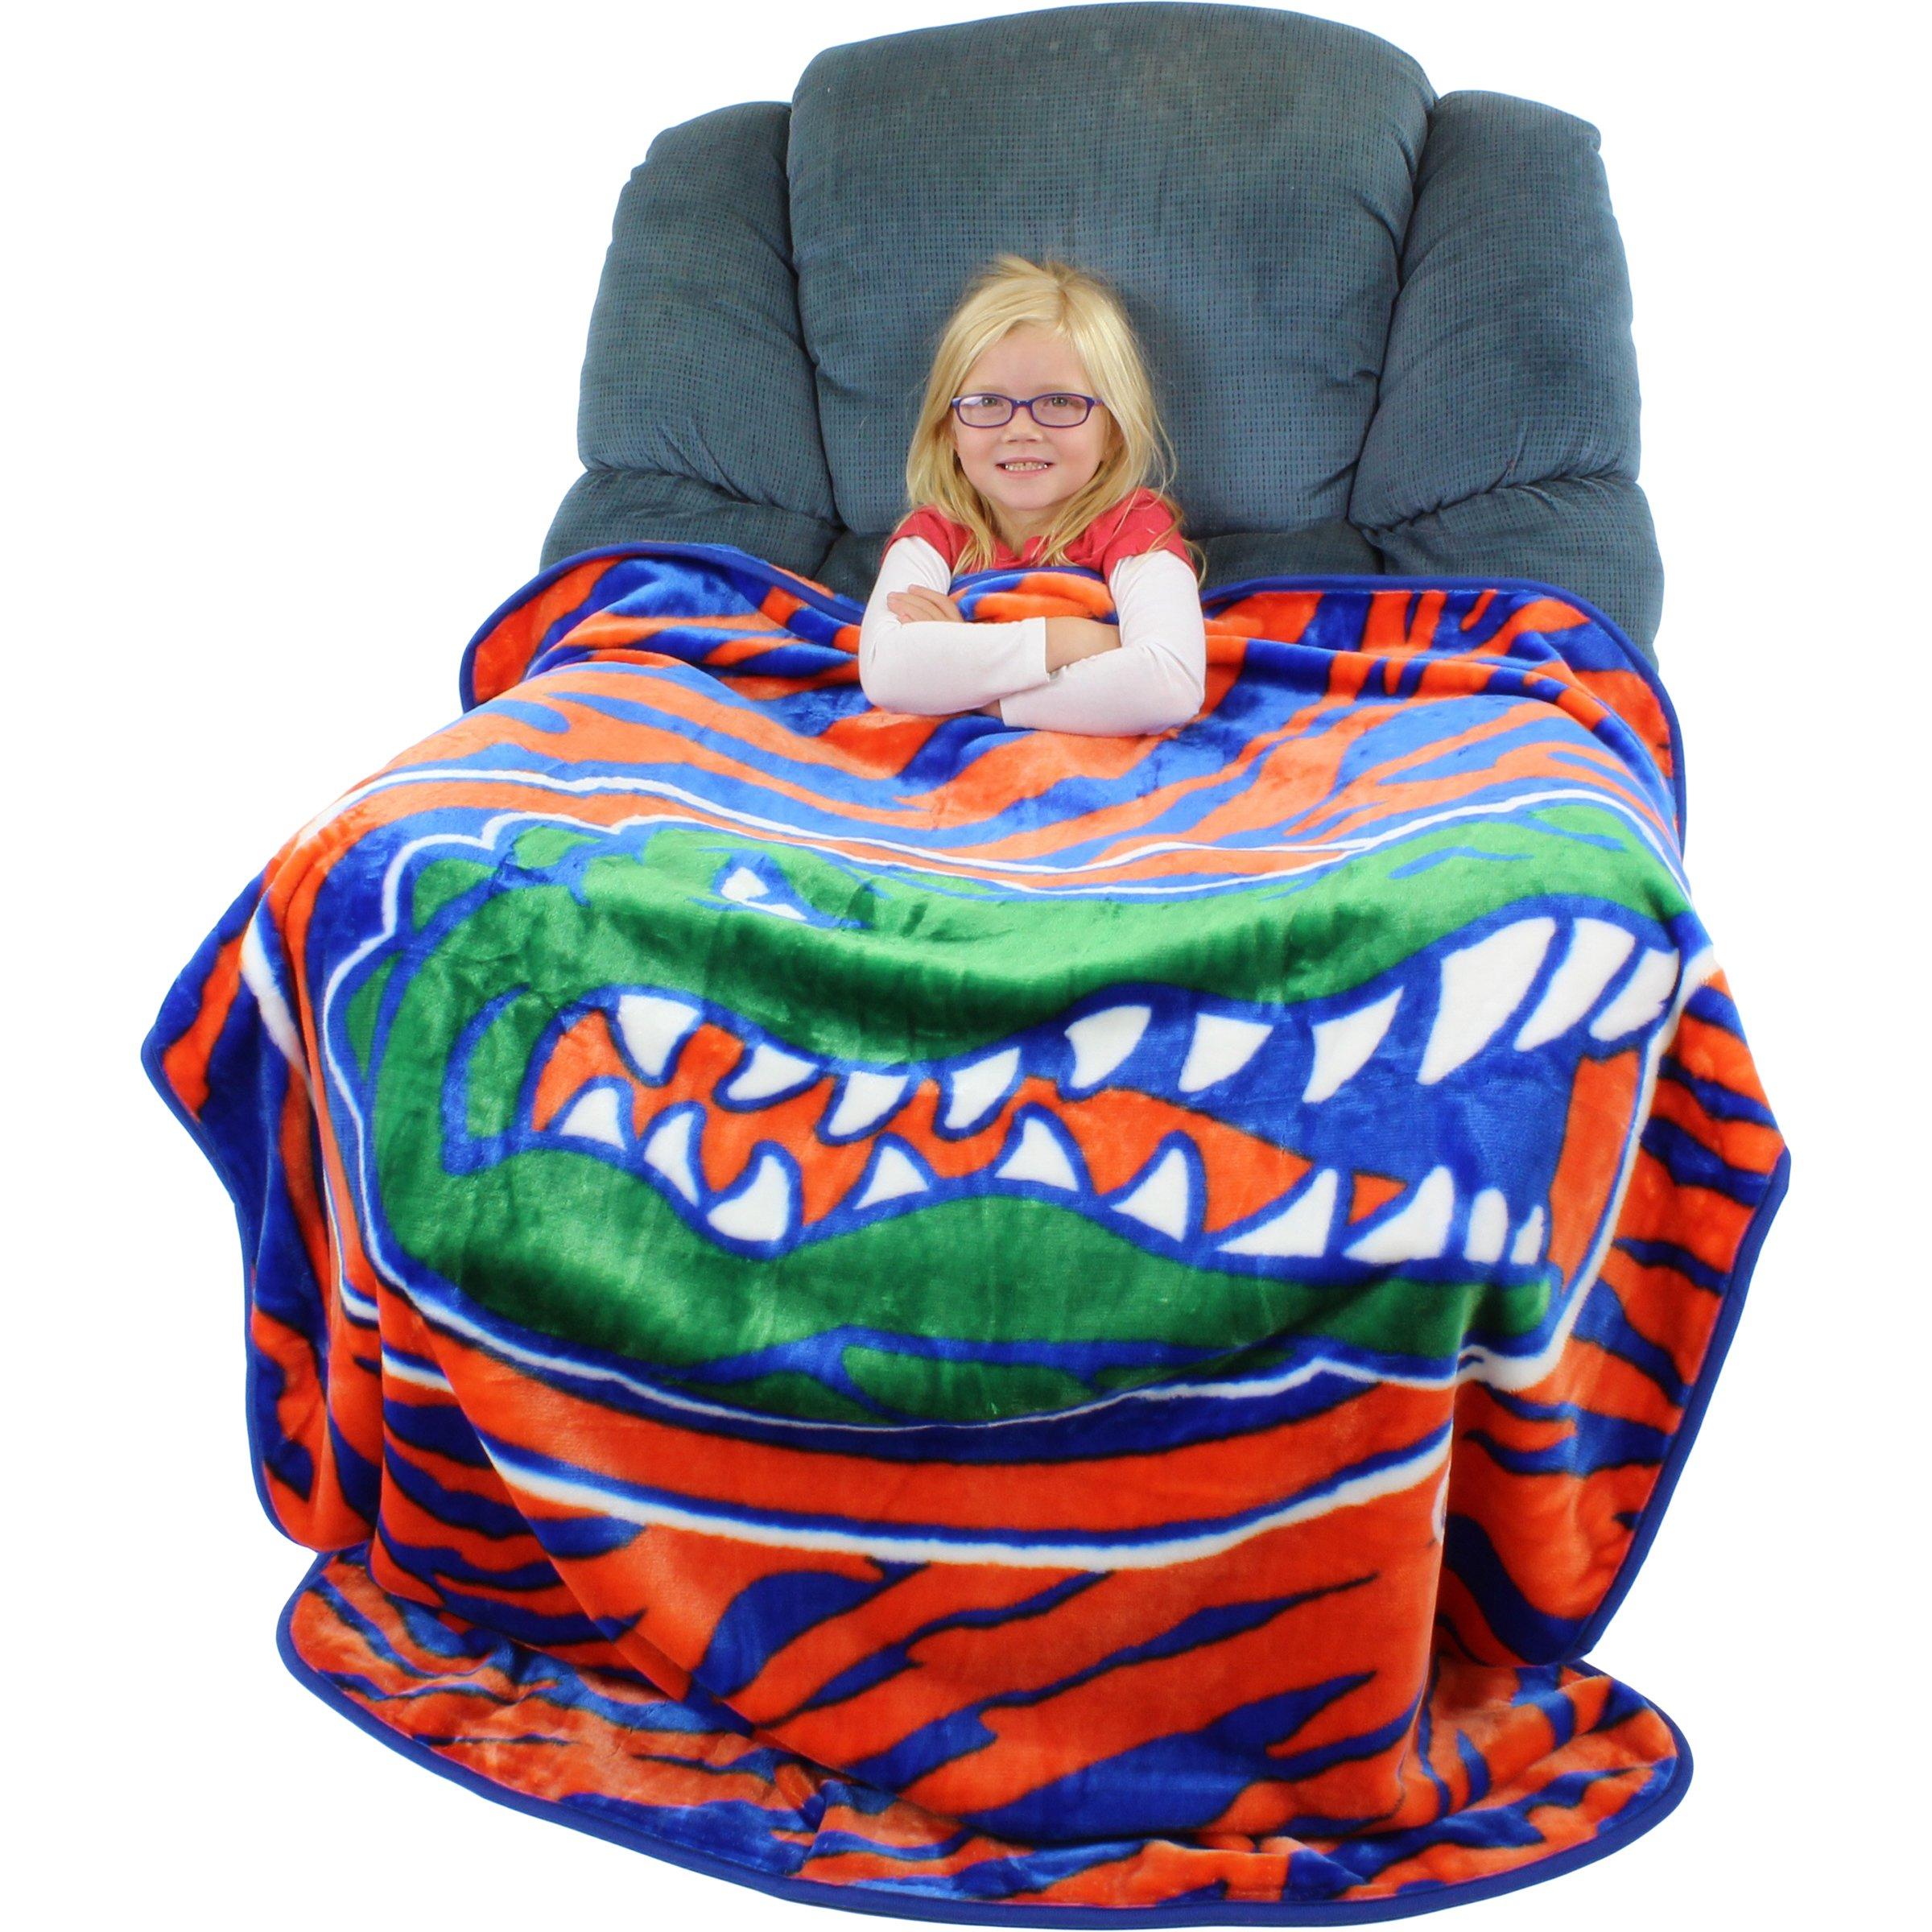 College Covers Florida Gators Super Soft Raschel Throw Blanket, 50'' x 60''